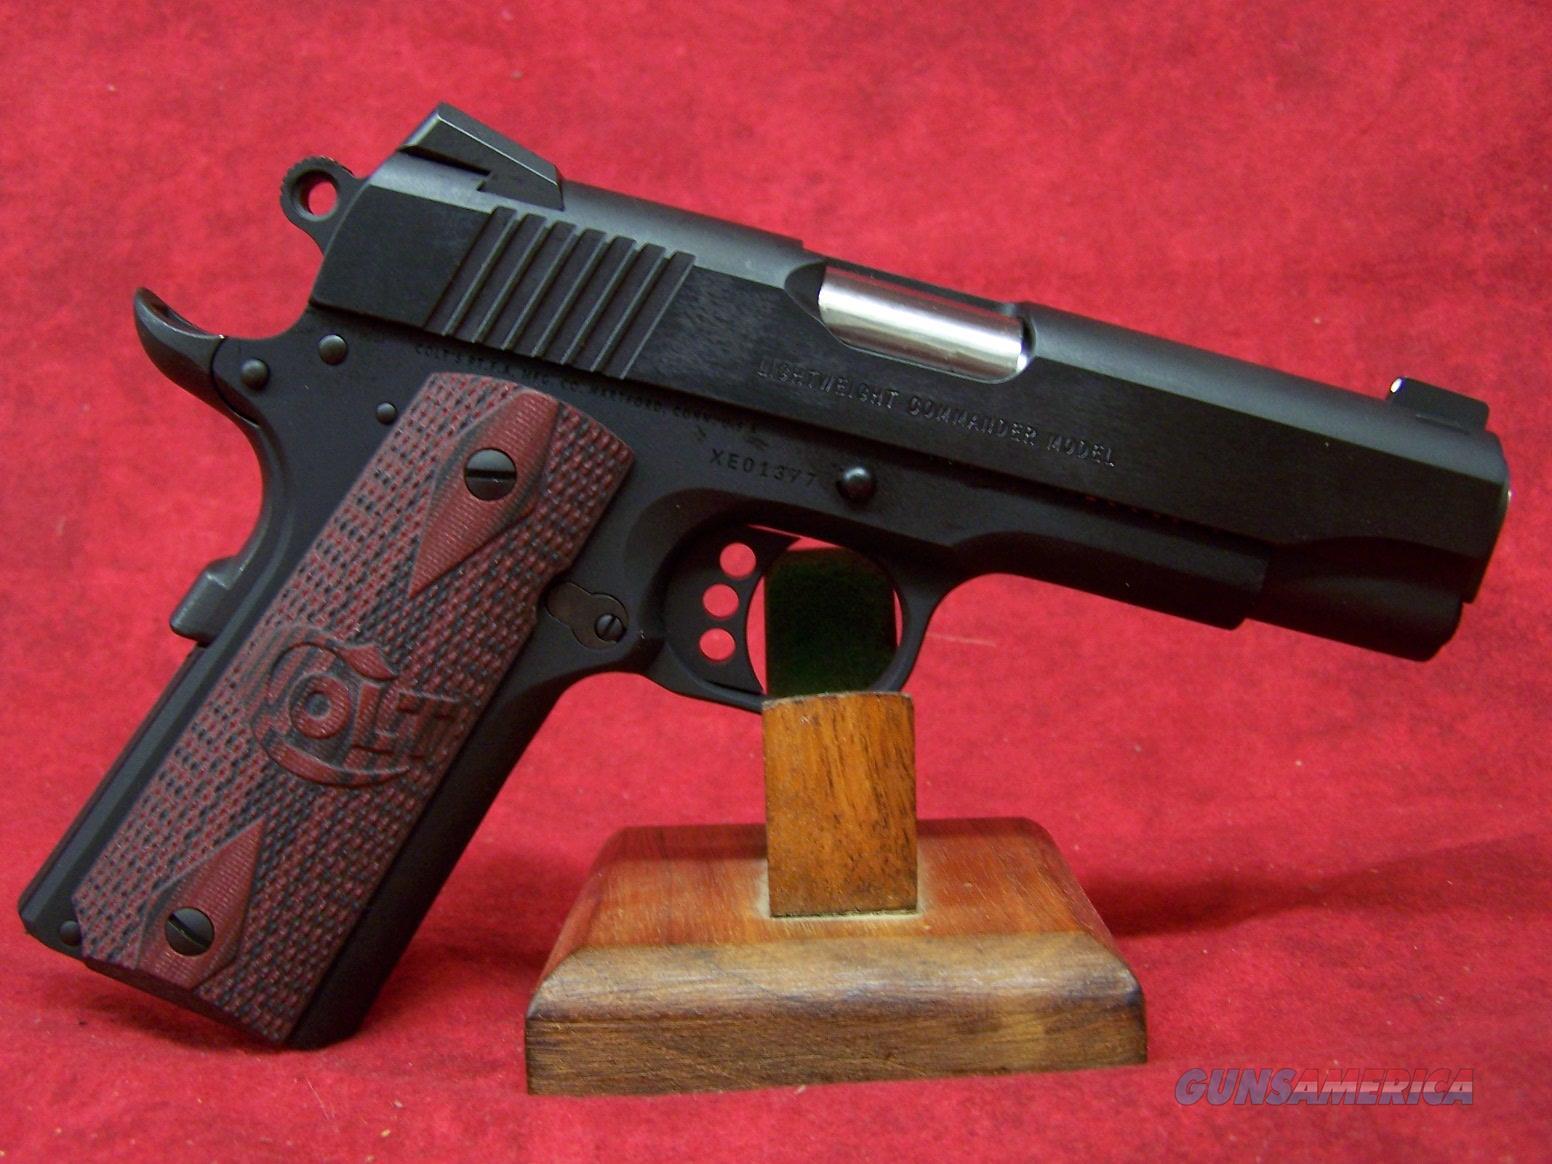 Colt Lightweight Commander .45 ACP 4.25 Inch Barrel Blue Finish Carbon Steel Slide (04840XE)  Guns > Pistols > Colt Automatic Pistols (1911 & Var)